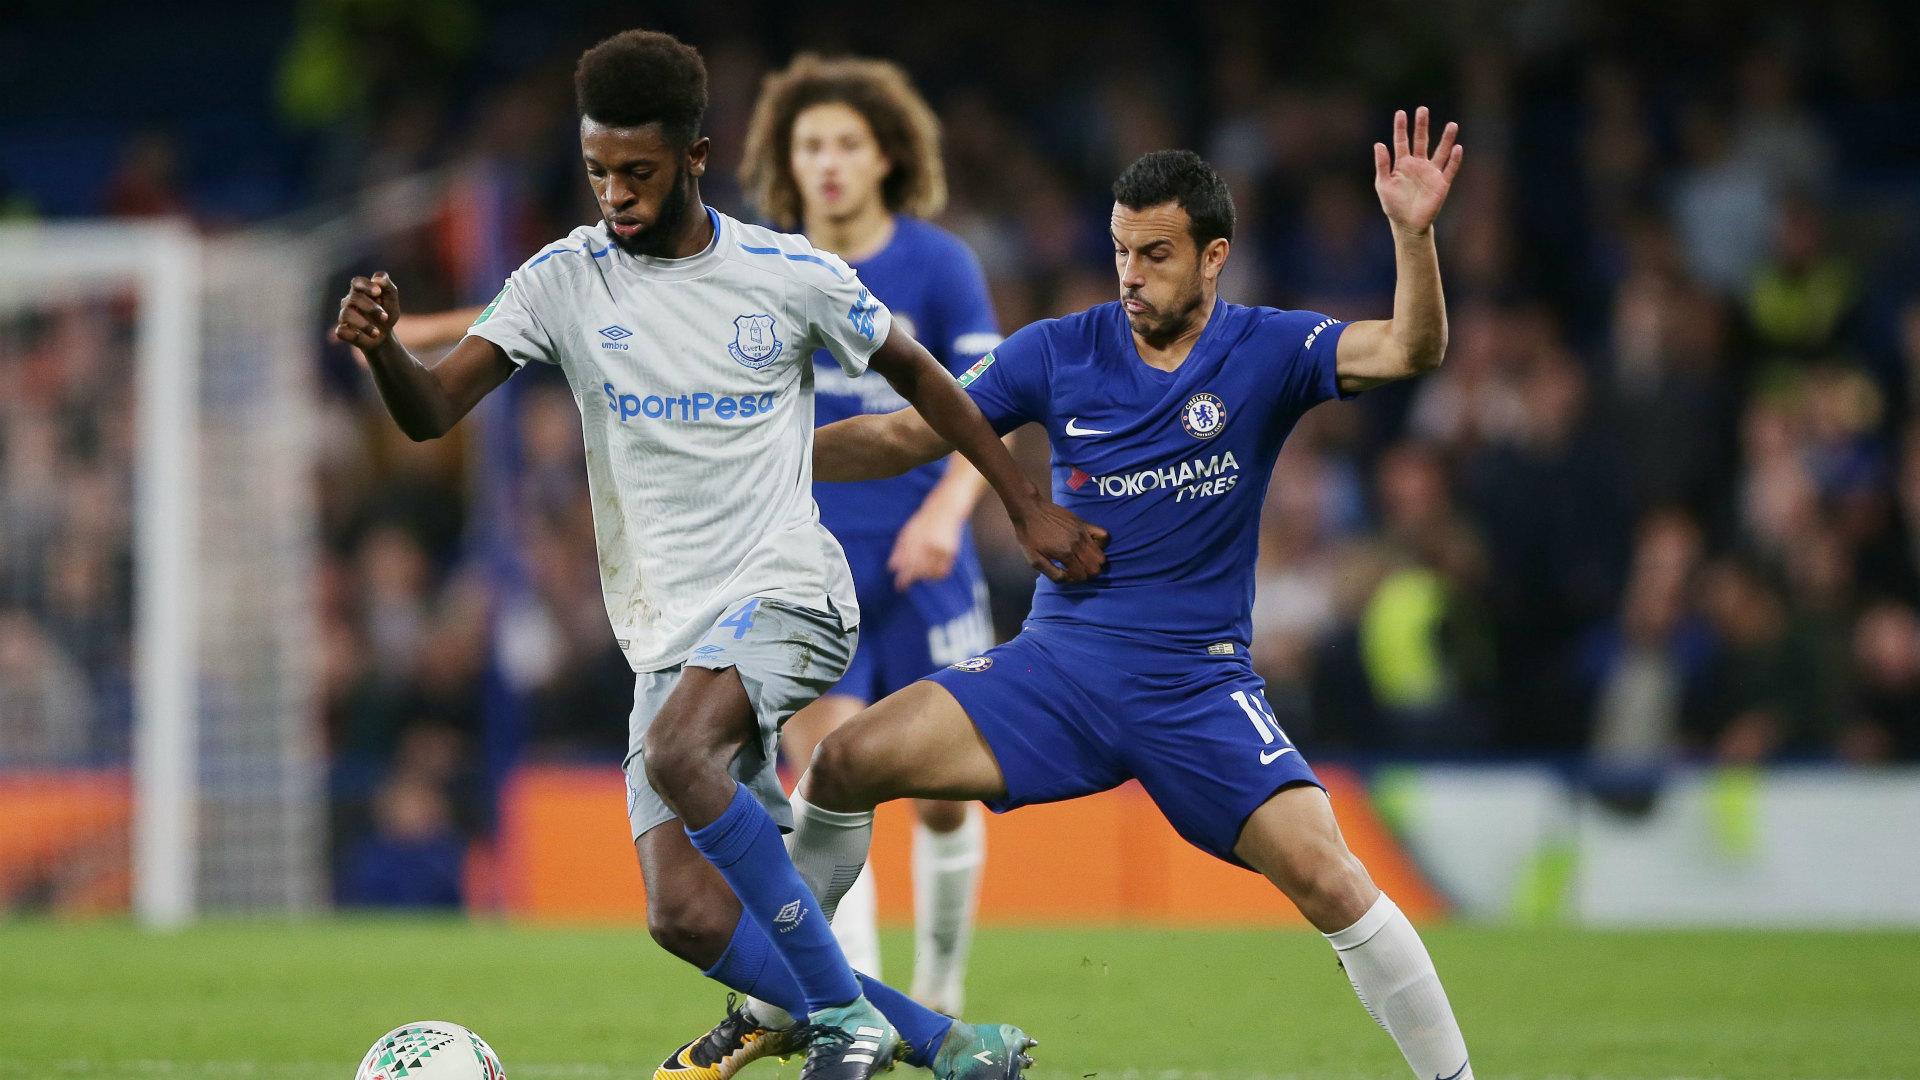 Baningime: Hearts complete permanent signing of Everton midfielder